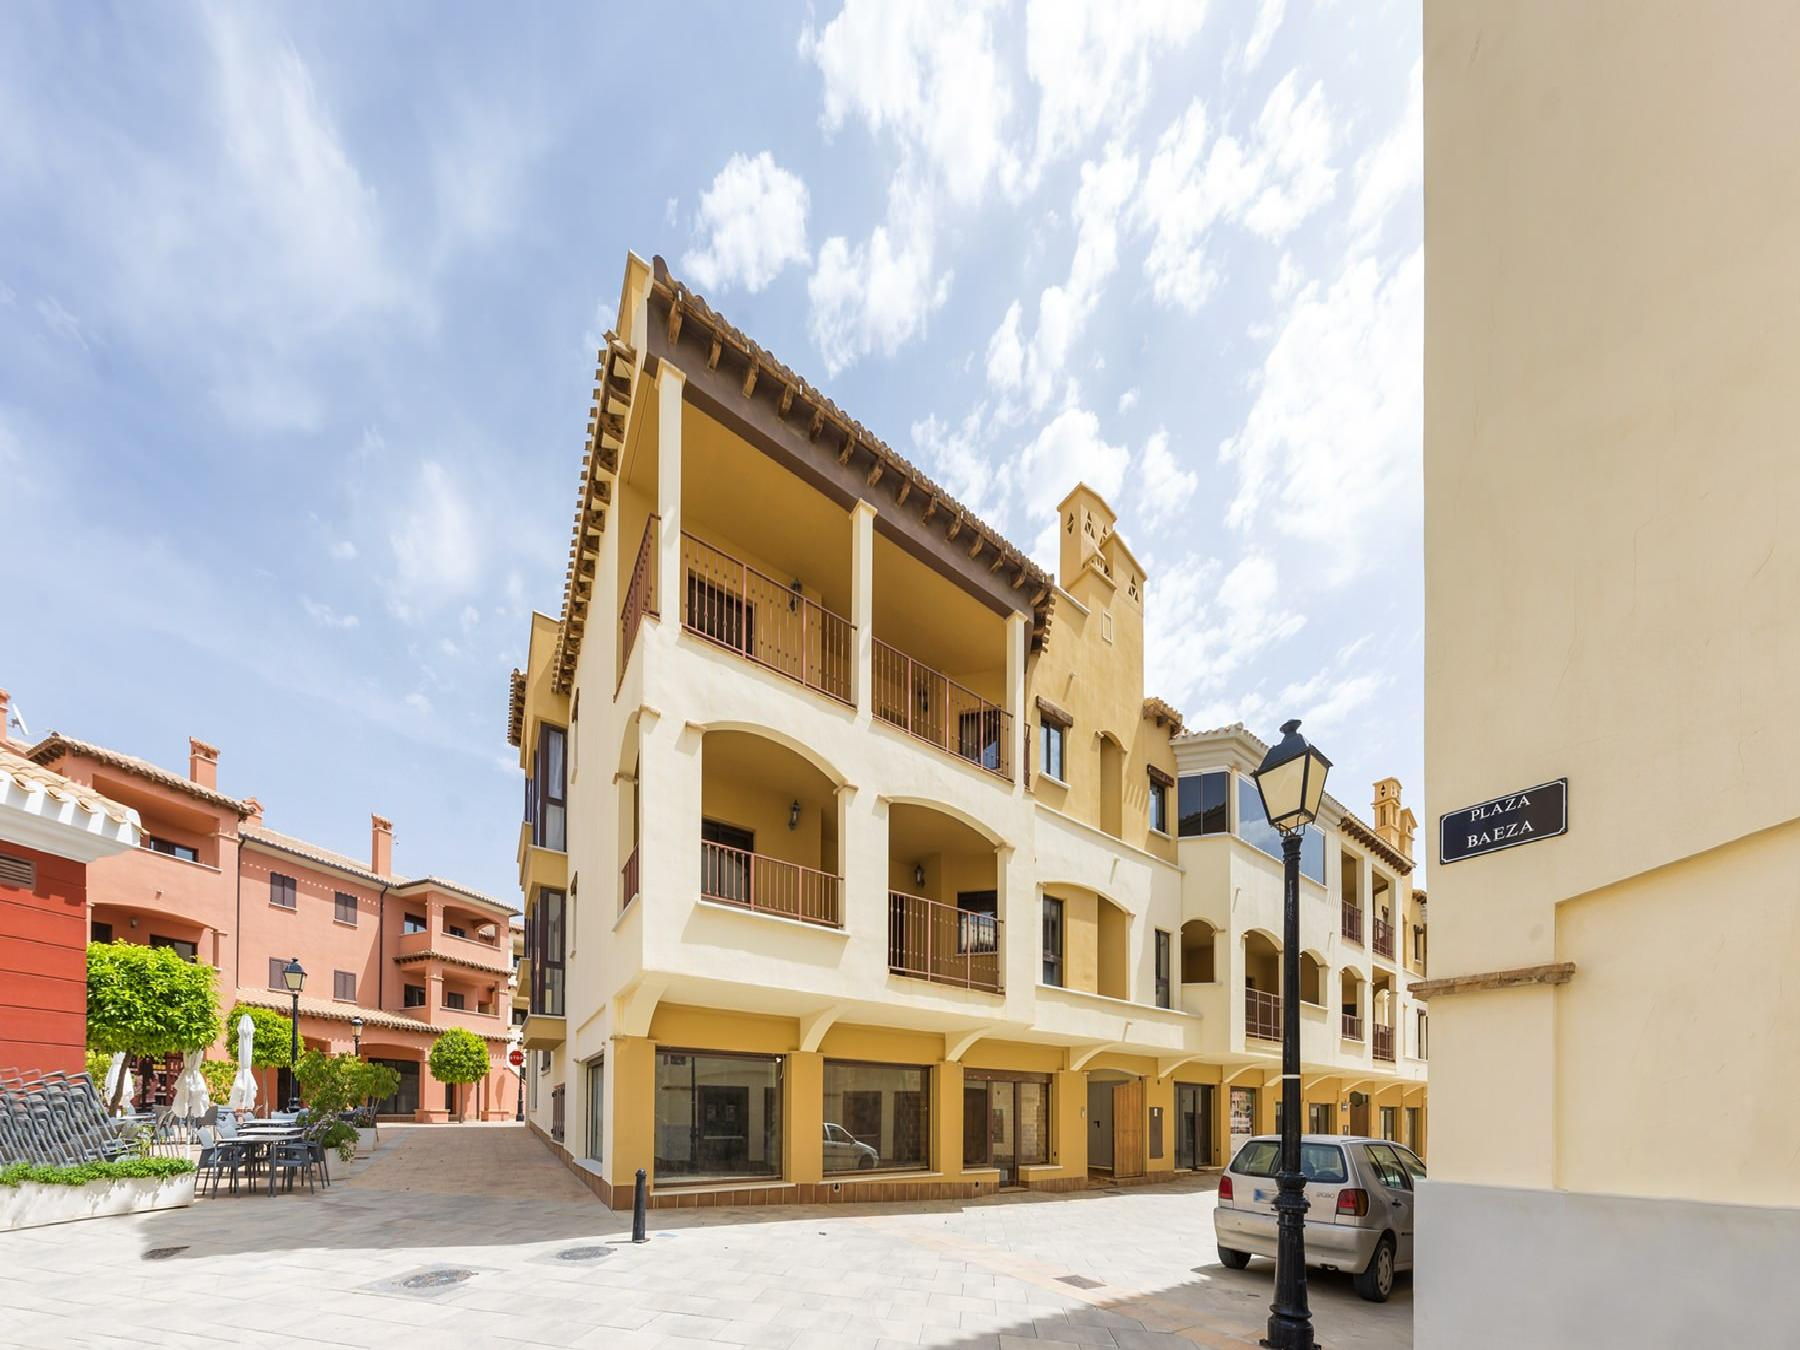 House in Fuente Alamo de Murcia